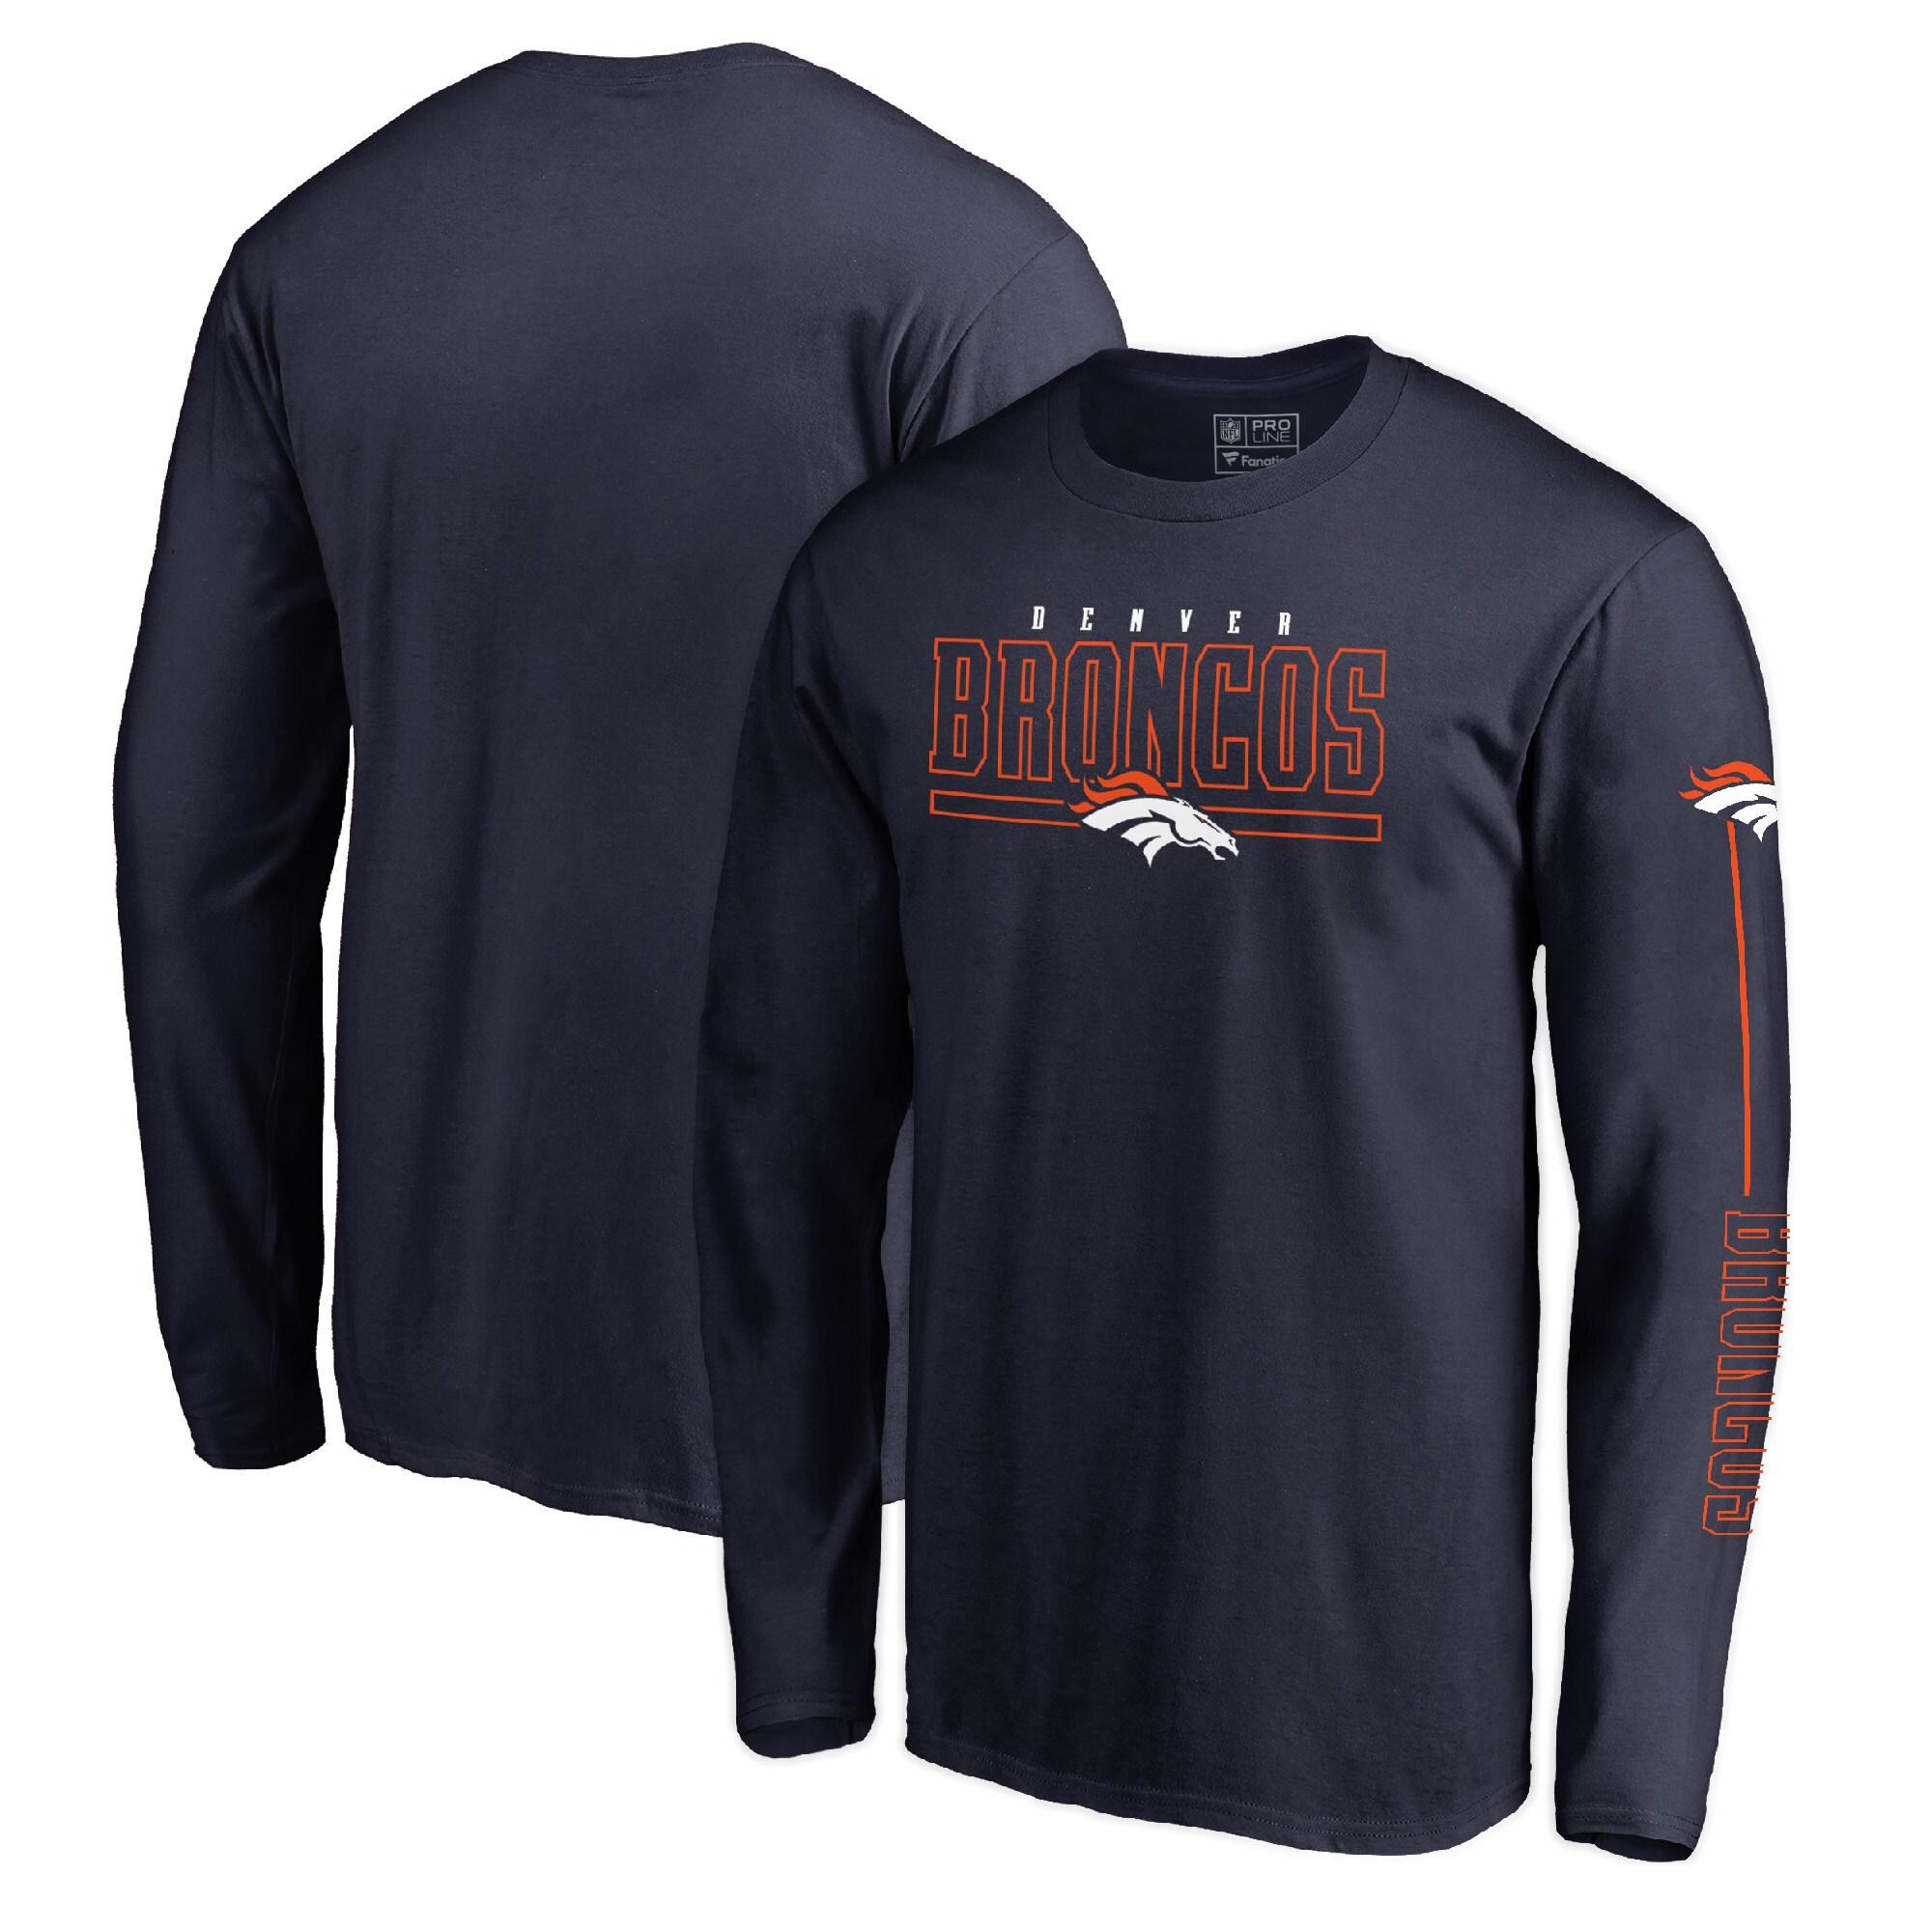 Denver Broncos NFL Pro Line by Fanatics Branded Front Line Long Sleeve T-Shirt - Navy